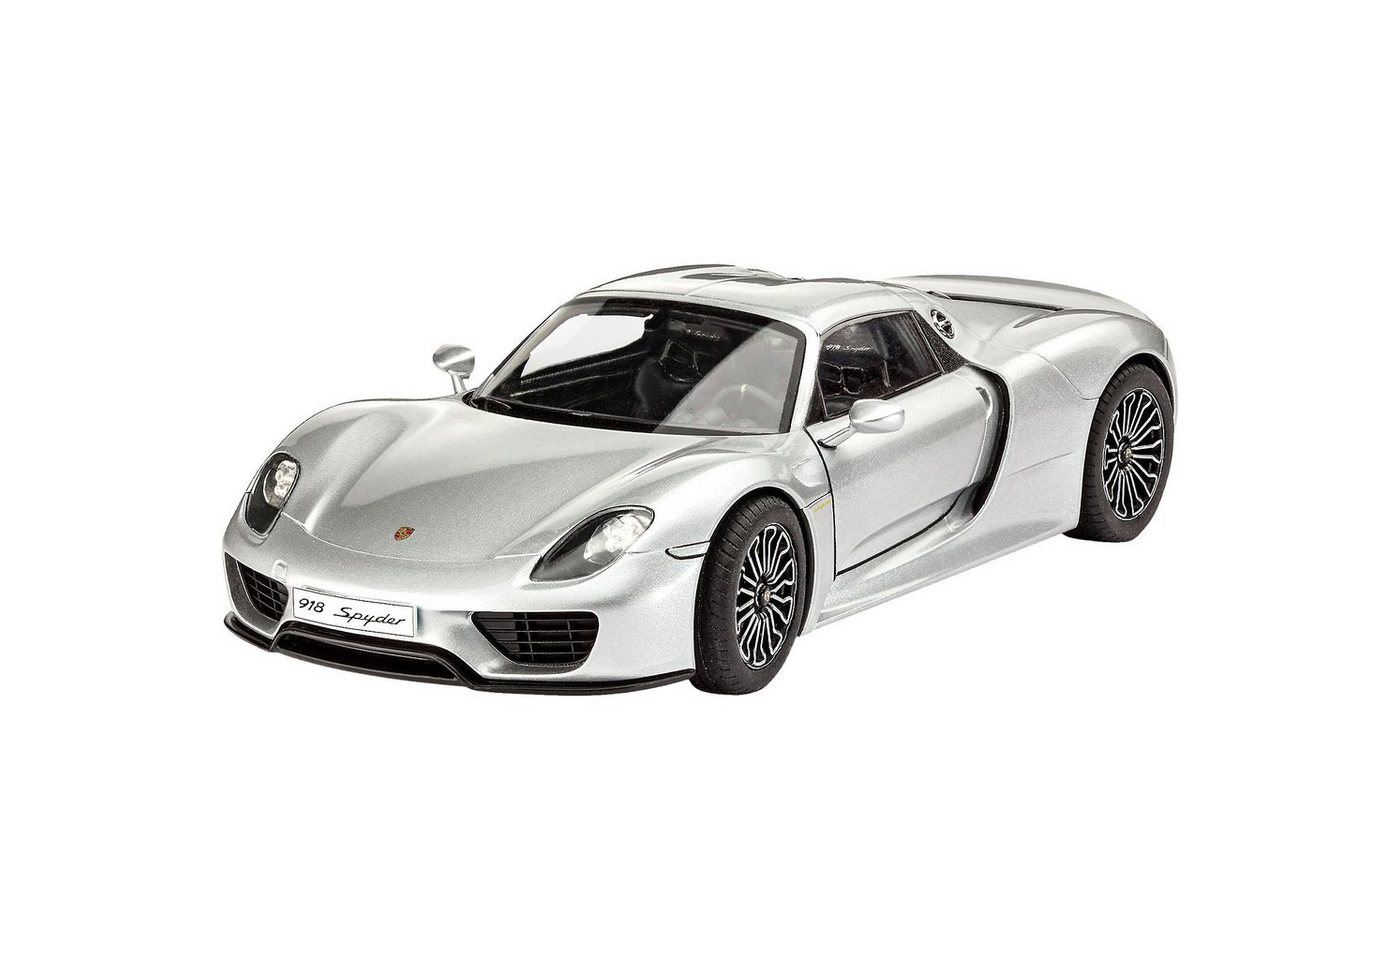 Revell® Modellbausatz Porsche 918 Spyder im Maßstab 1:24